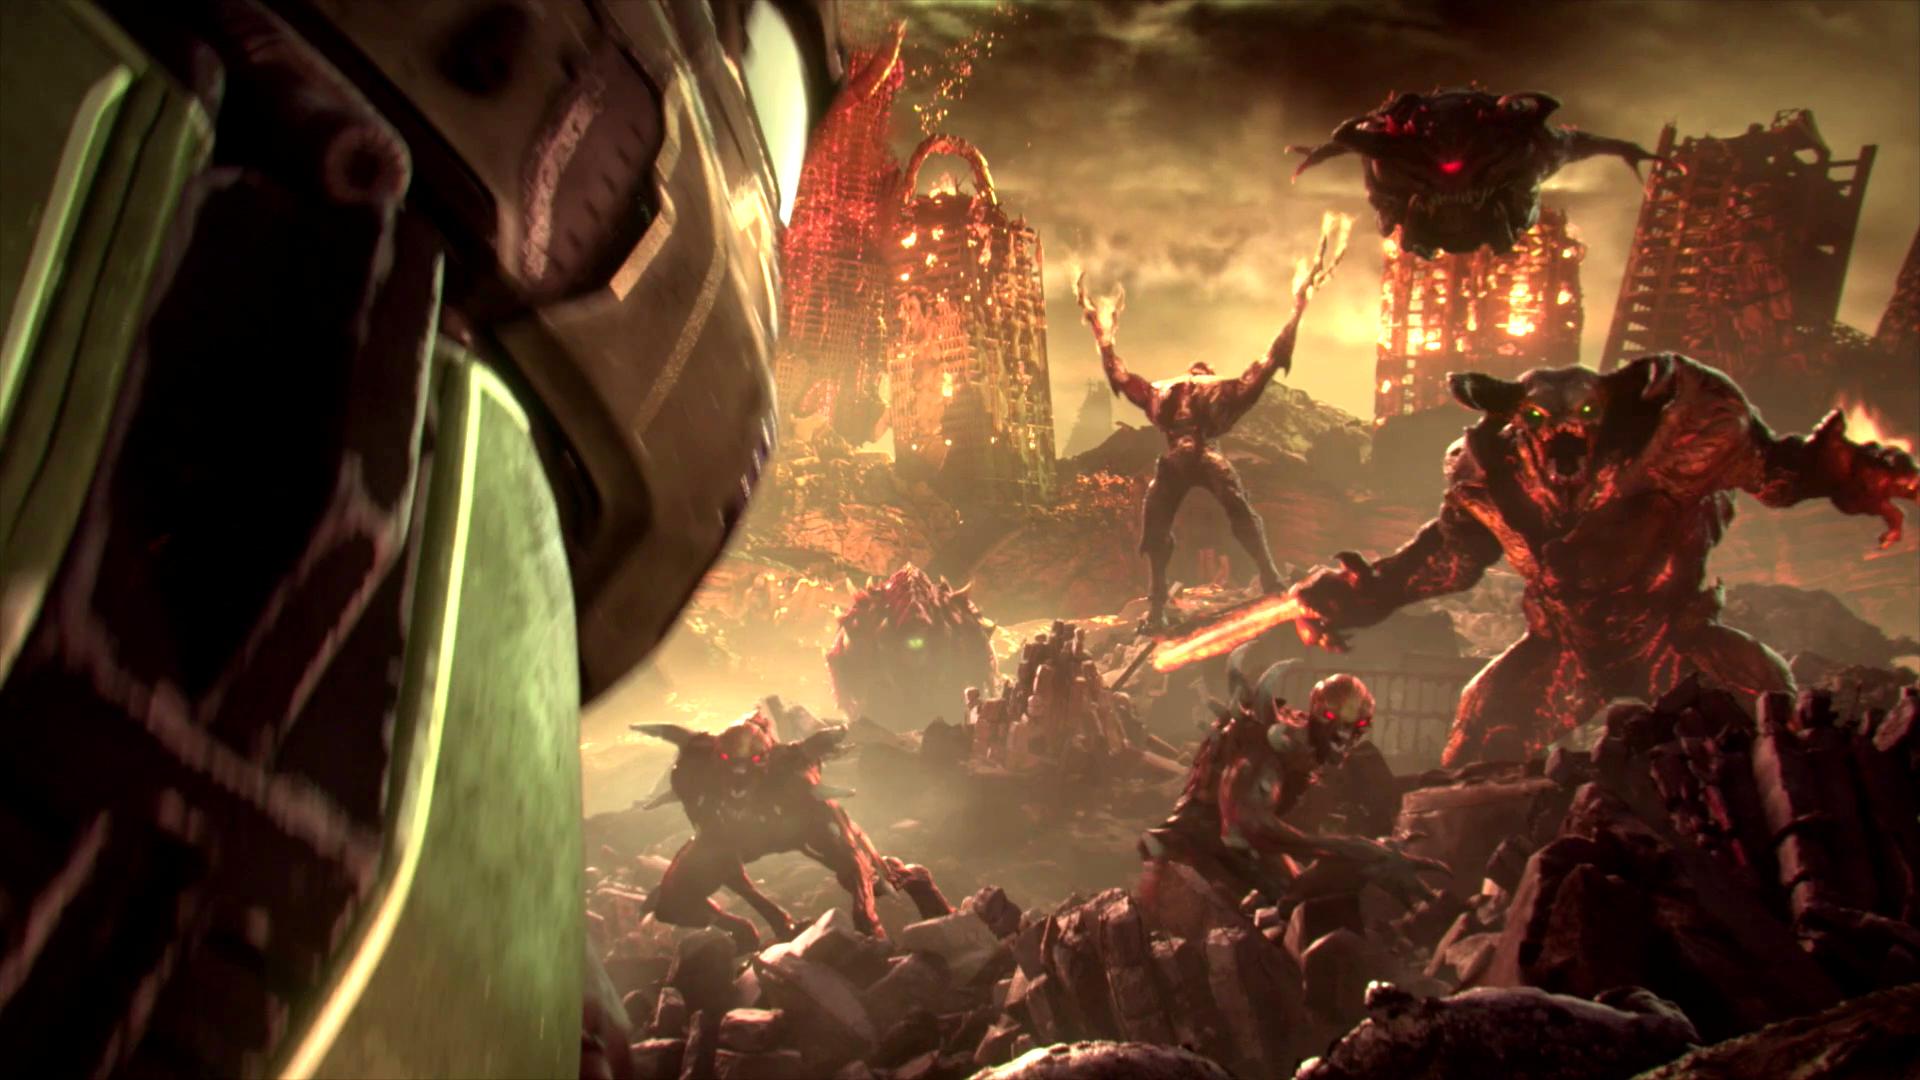 Doom Eternal Official E3 2018 Teaser Trailer Hd Doom Eternity Wallpaper